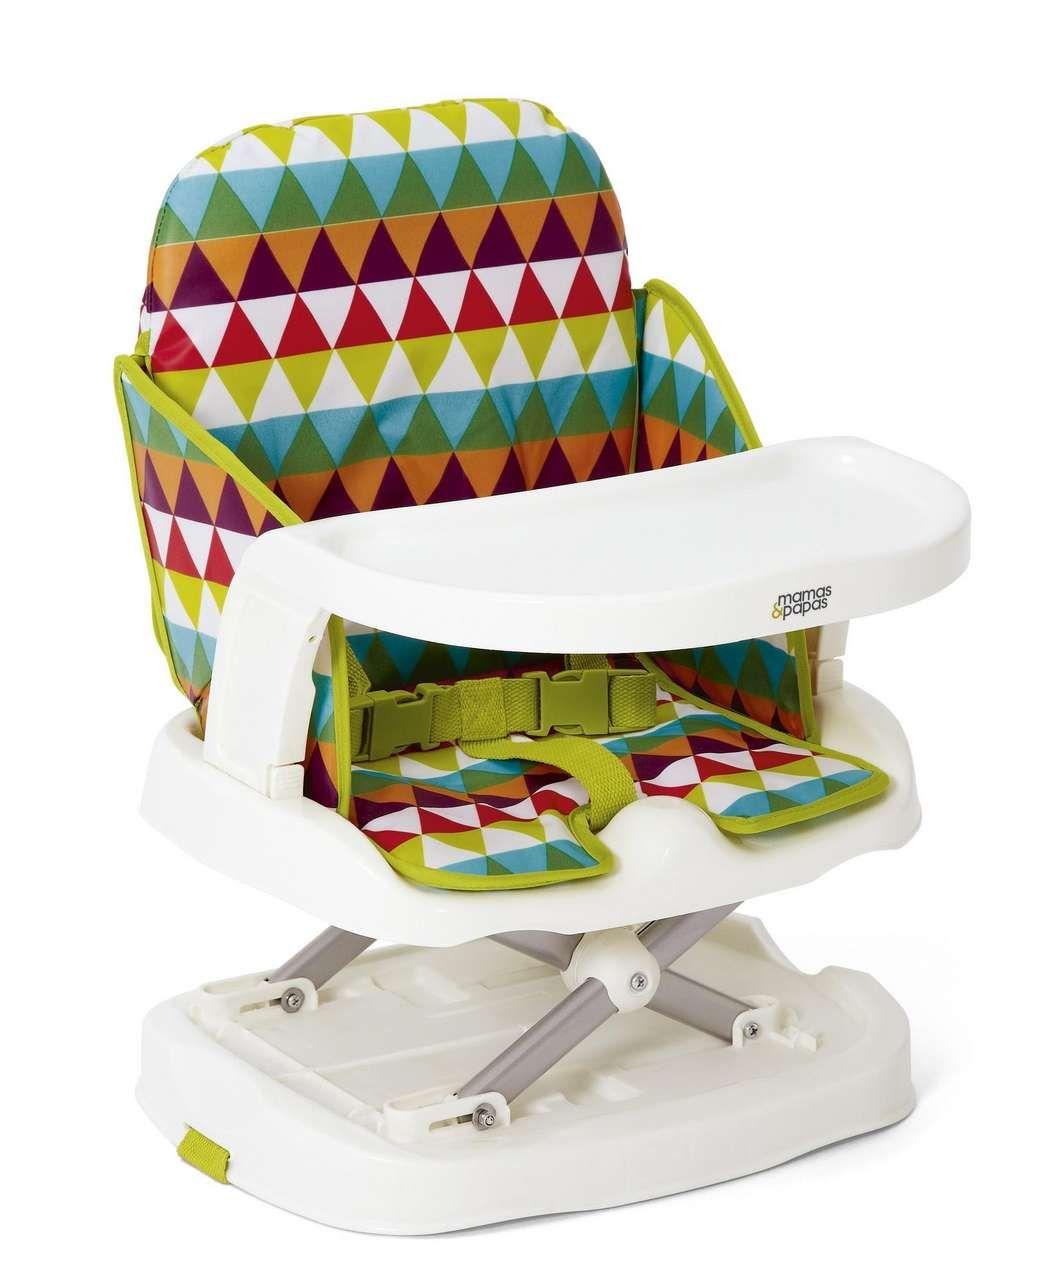 Travel Booster Seat Pippop Mamas Papas Mamas And Papas Prams And Pushchairs Travel Booster Seat Addison drill bit price list